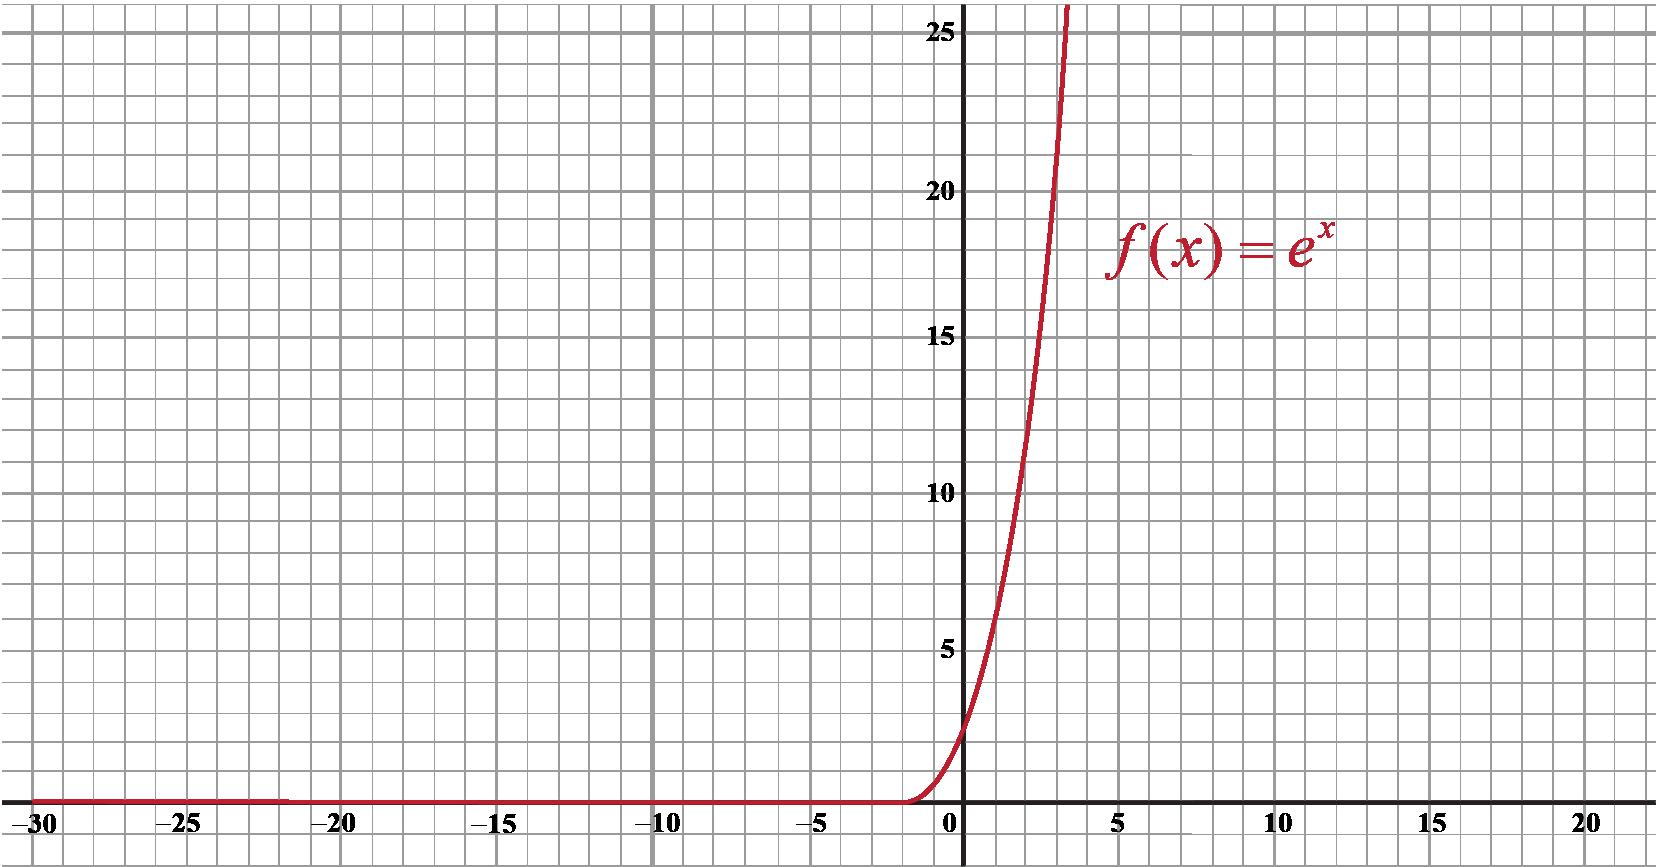 vertical transalation